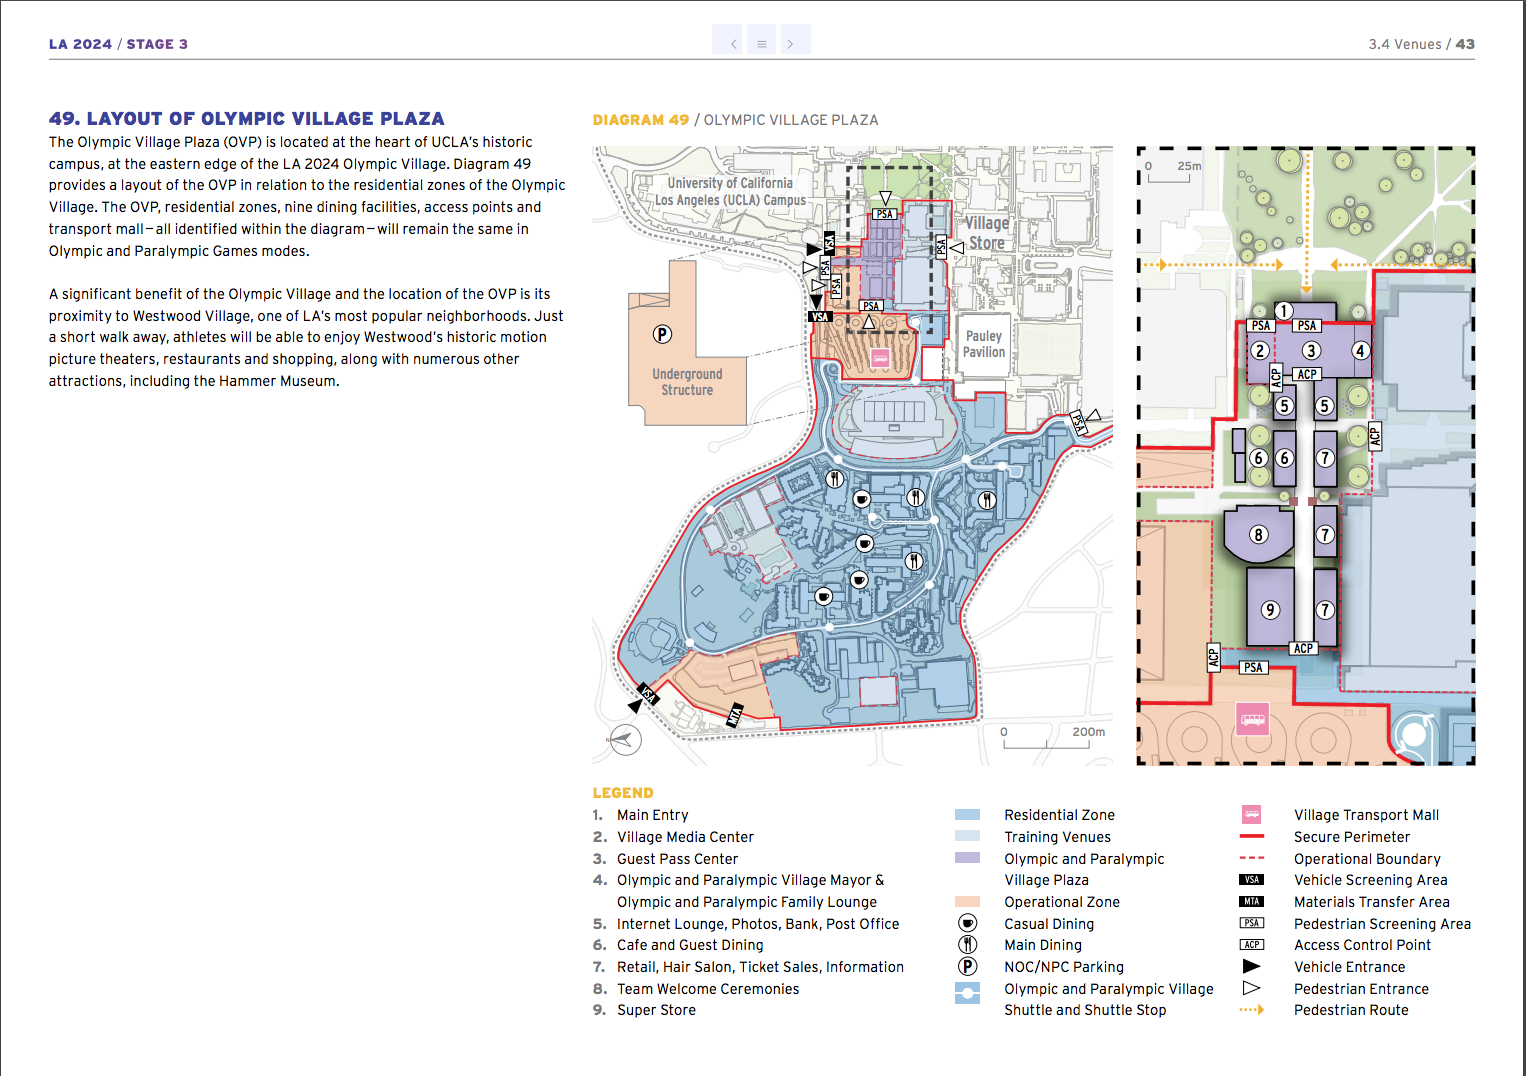 LA 2024 Olympic and Paralympic Bid Process - LA 2024 Athlete Village Map